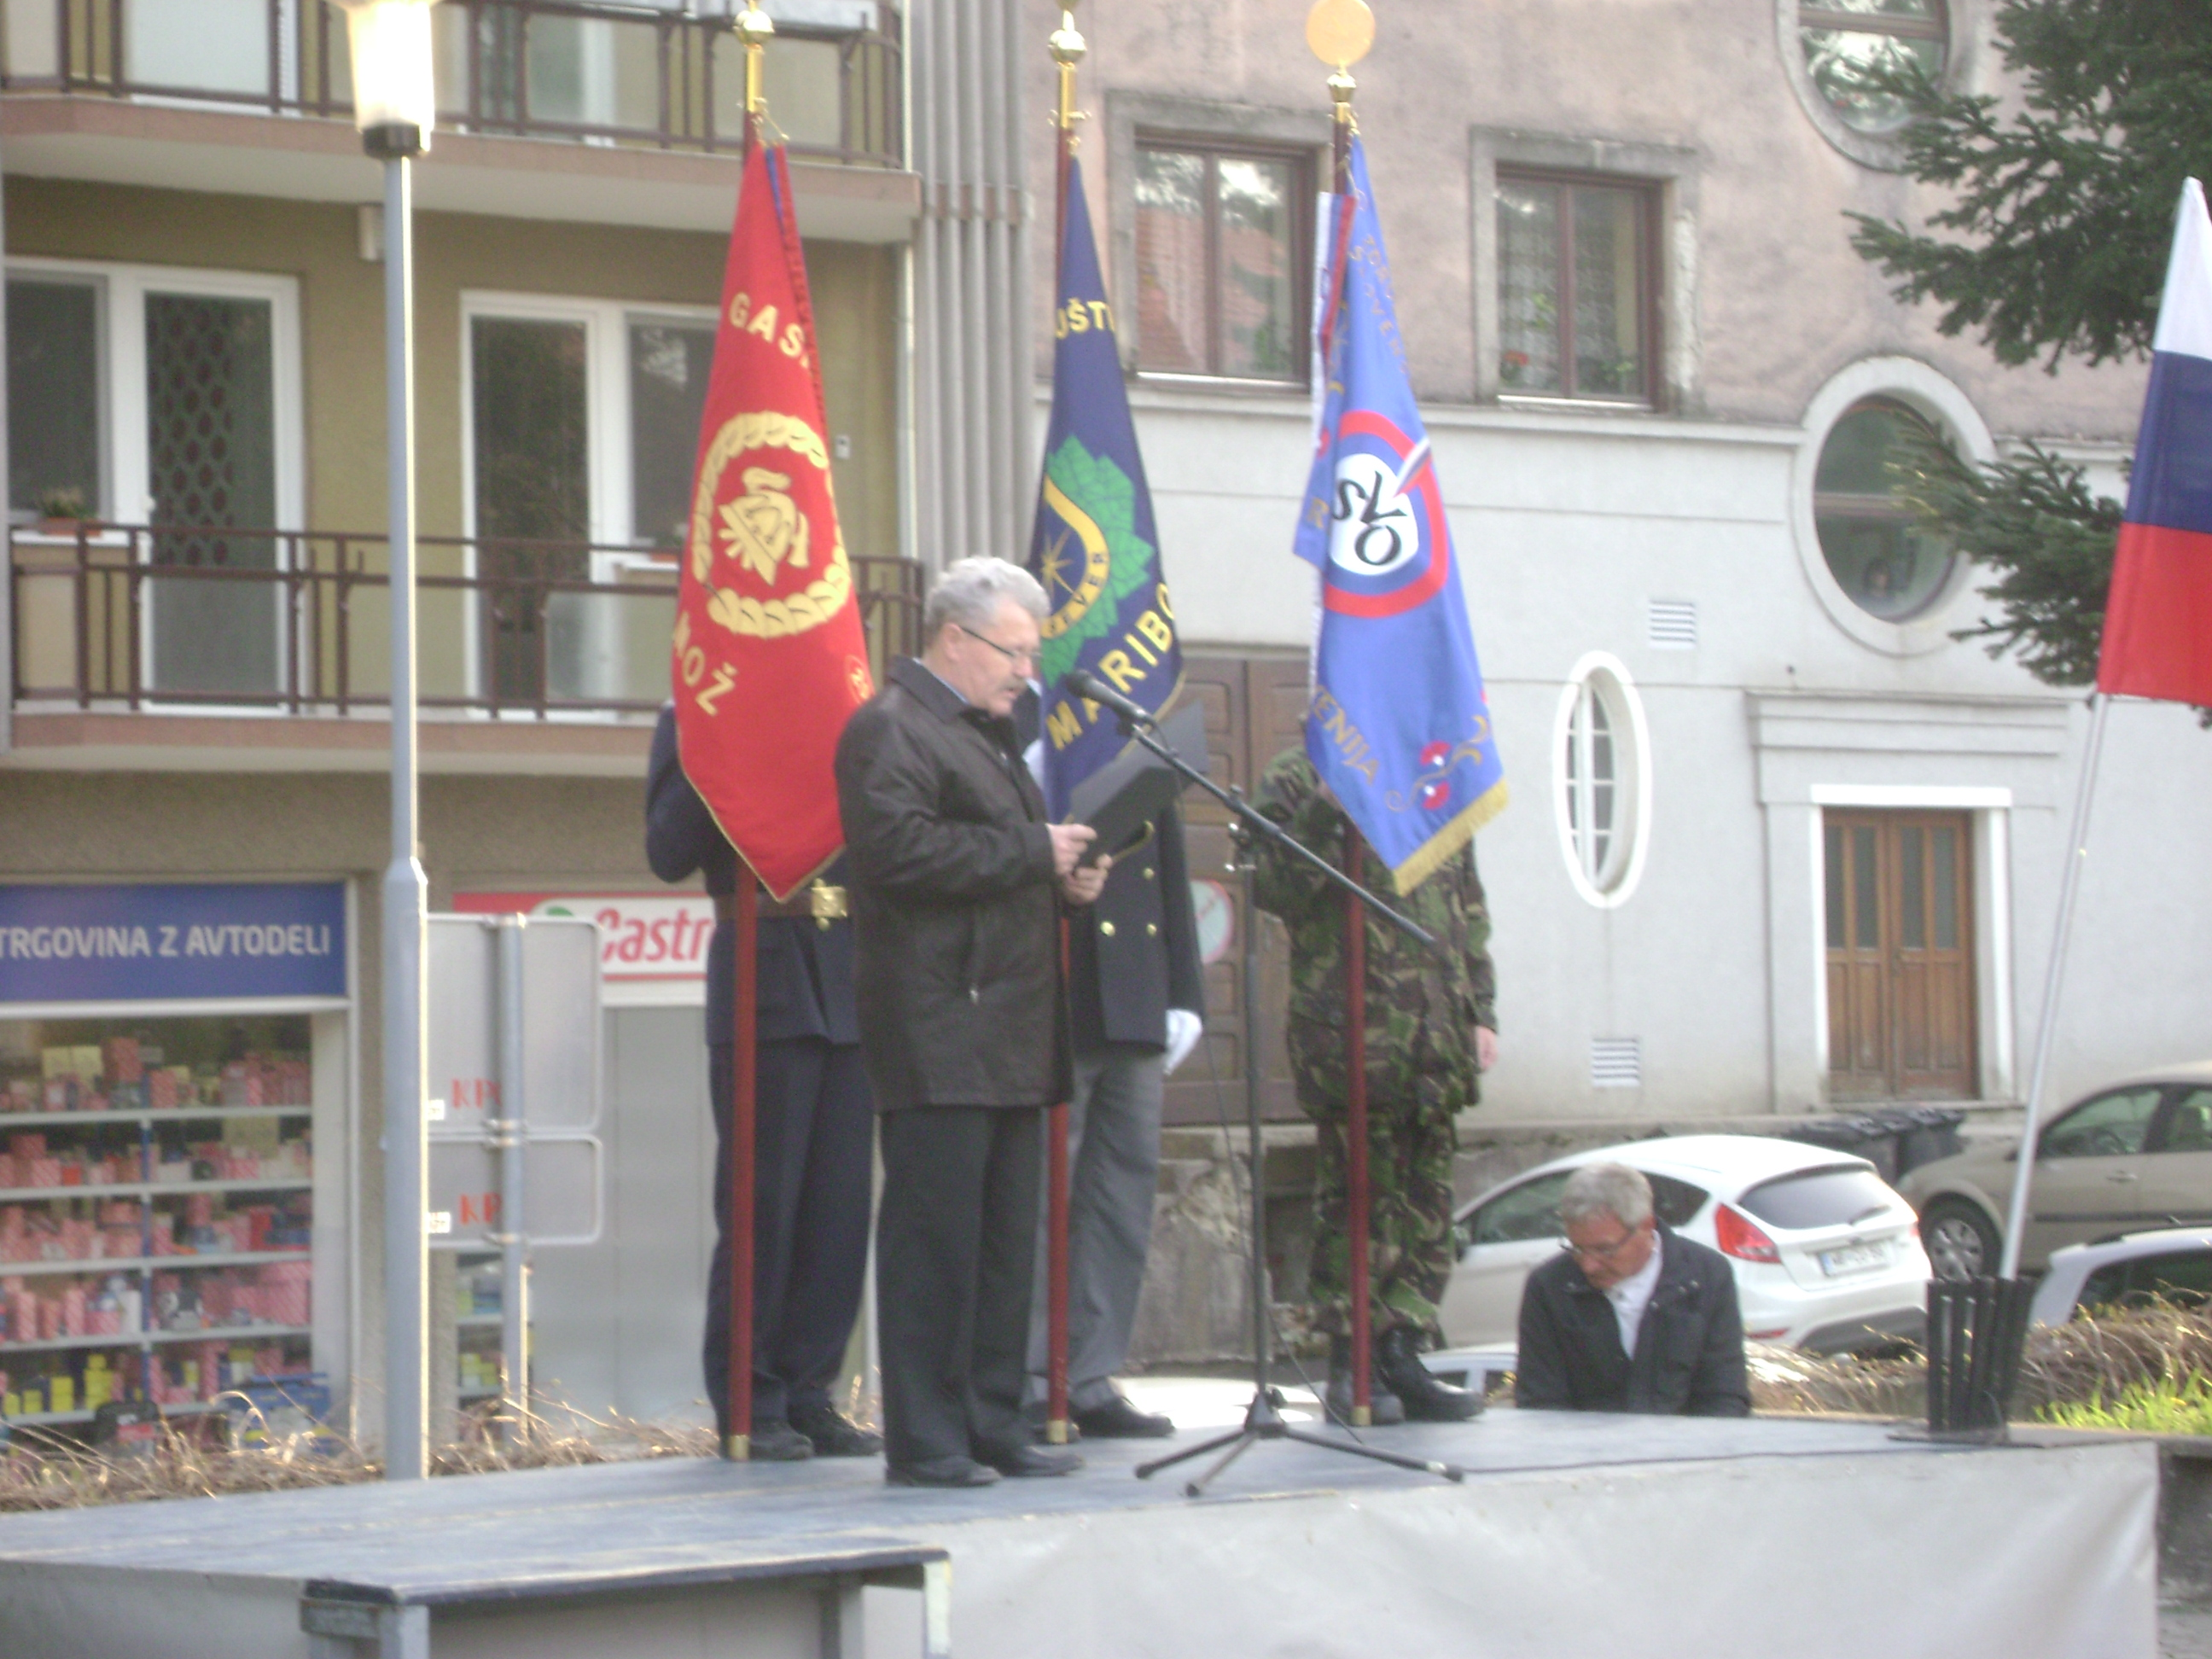 S slovesnosti v spomin generalu Rudolfu Maistru (1874 – 1934)